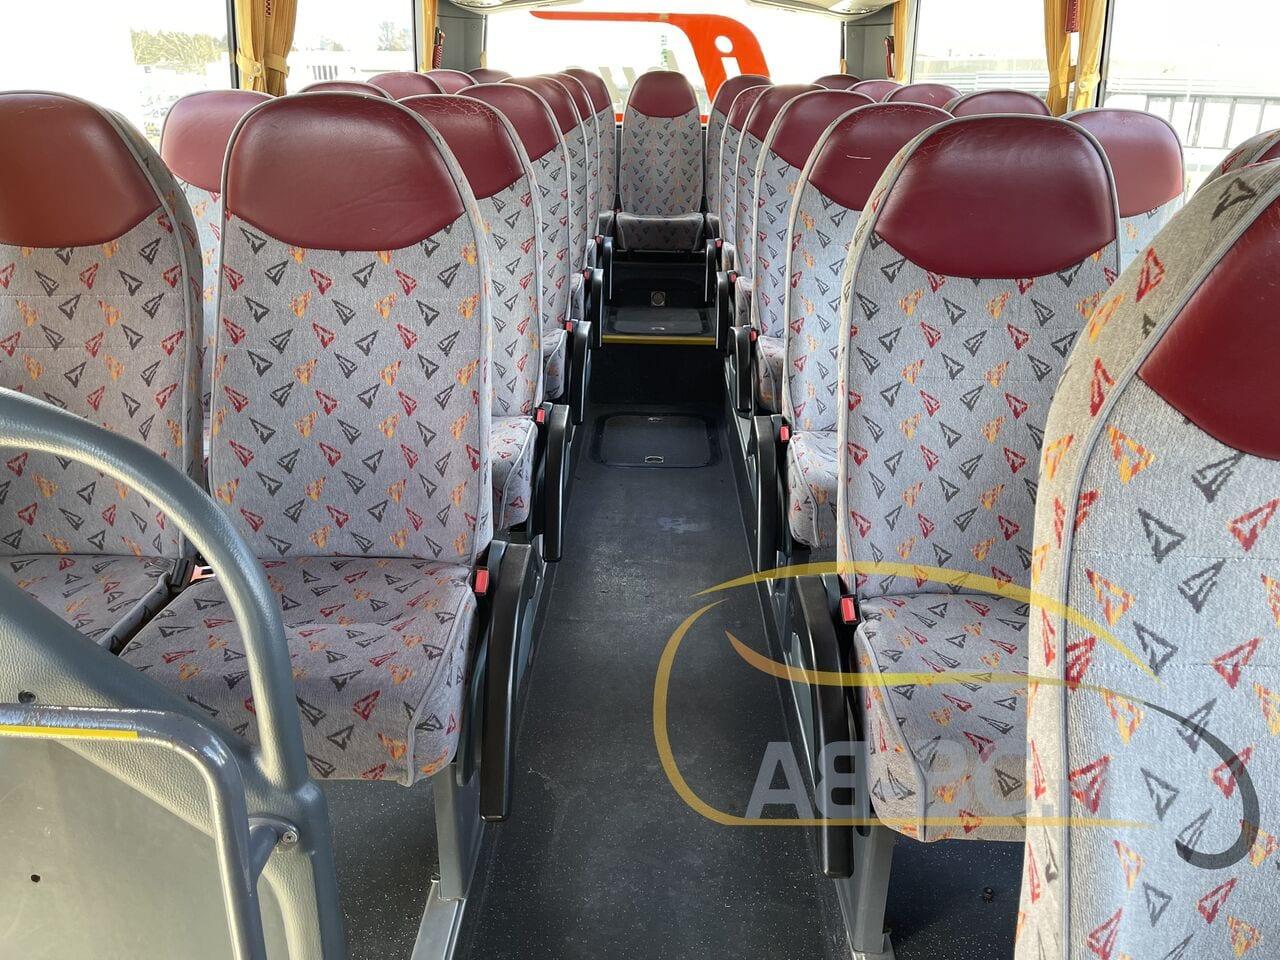 coach-busTEMSA-Safari-RD-53-Seats-DAF-Motor-12-mtr---1616166791853336047_big_cbd957216e32a120f12180dfd5e32599--21031917053743807500